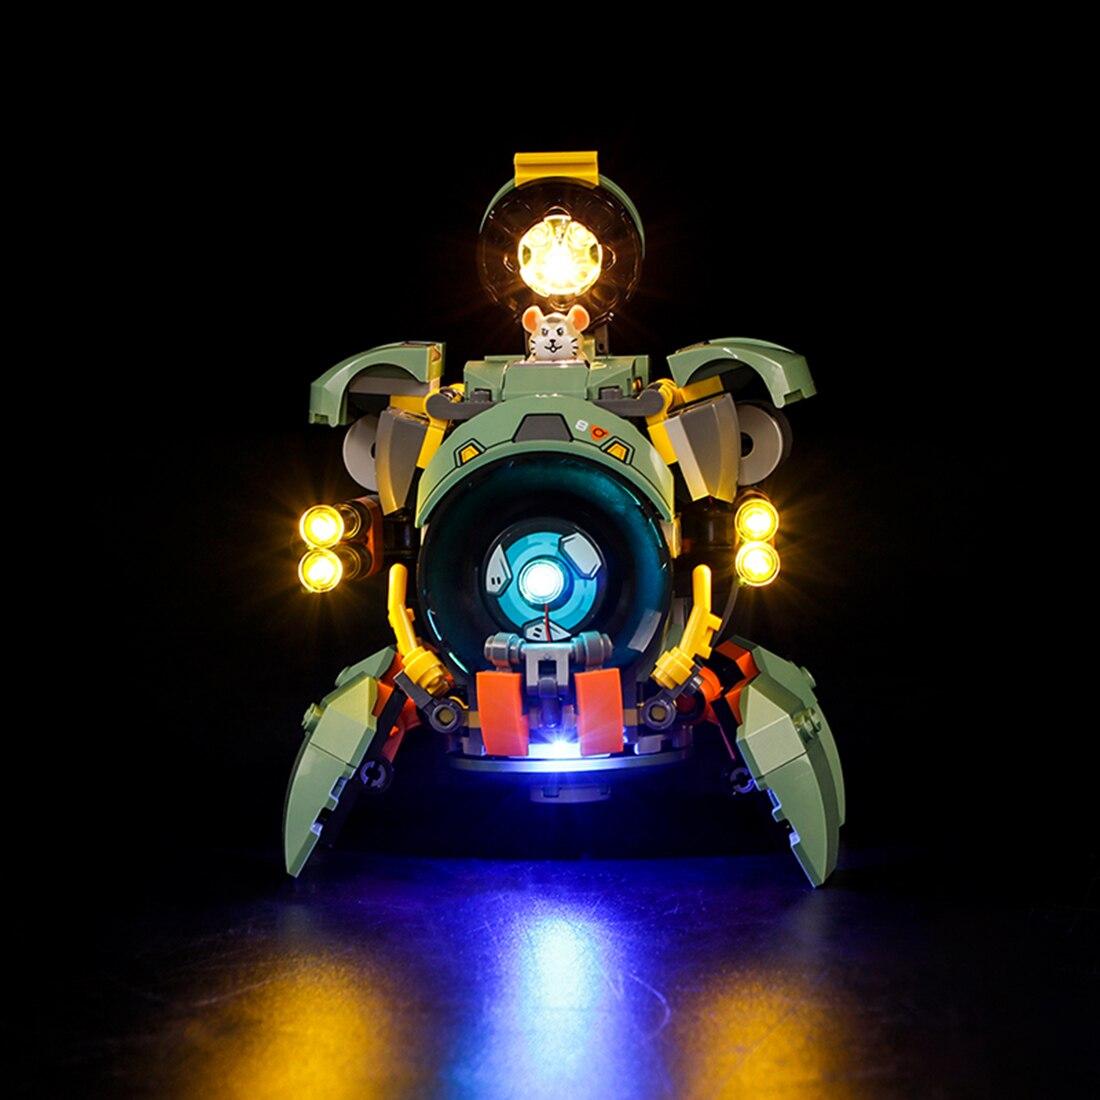 Vonado USB LED Lighting Kit For Overwatch Wrecking Ball 75976(LED Included Only, No Kit) Toy For Children Educational Toys Gift 3